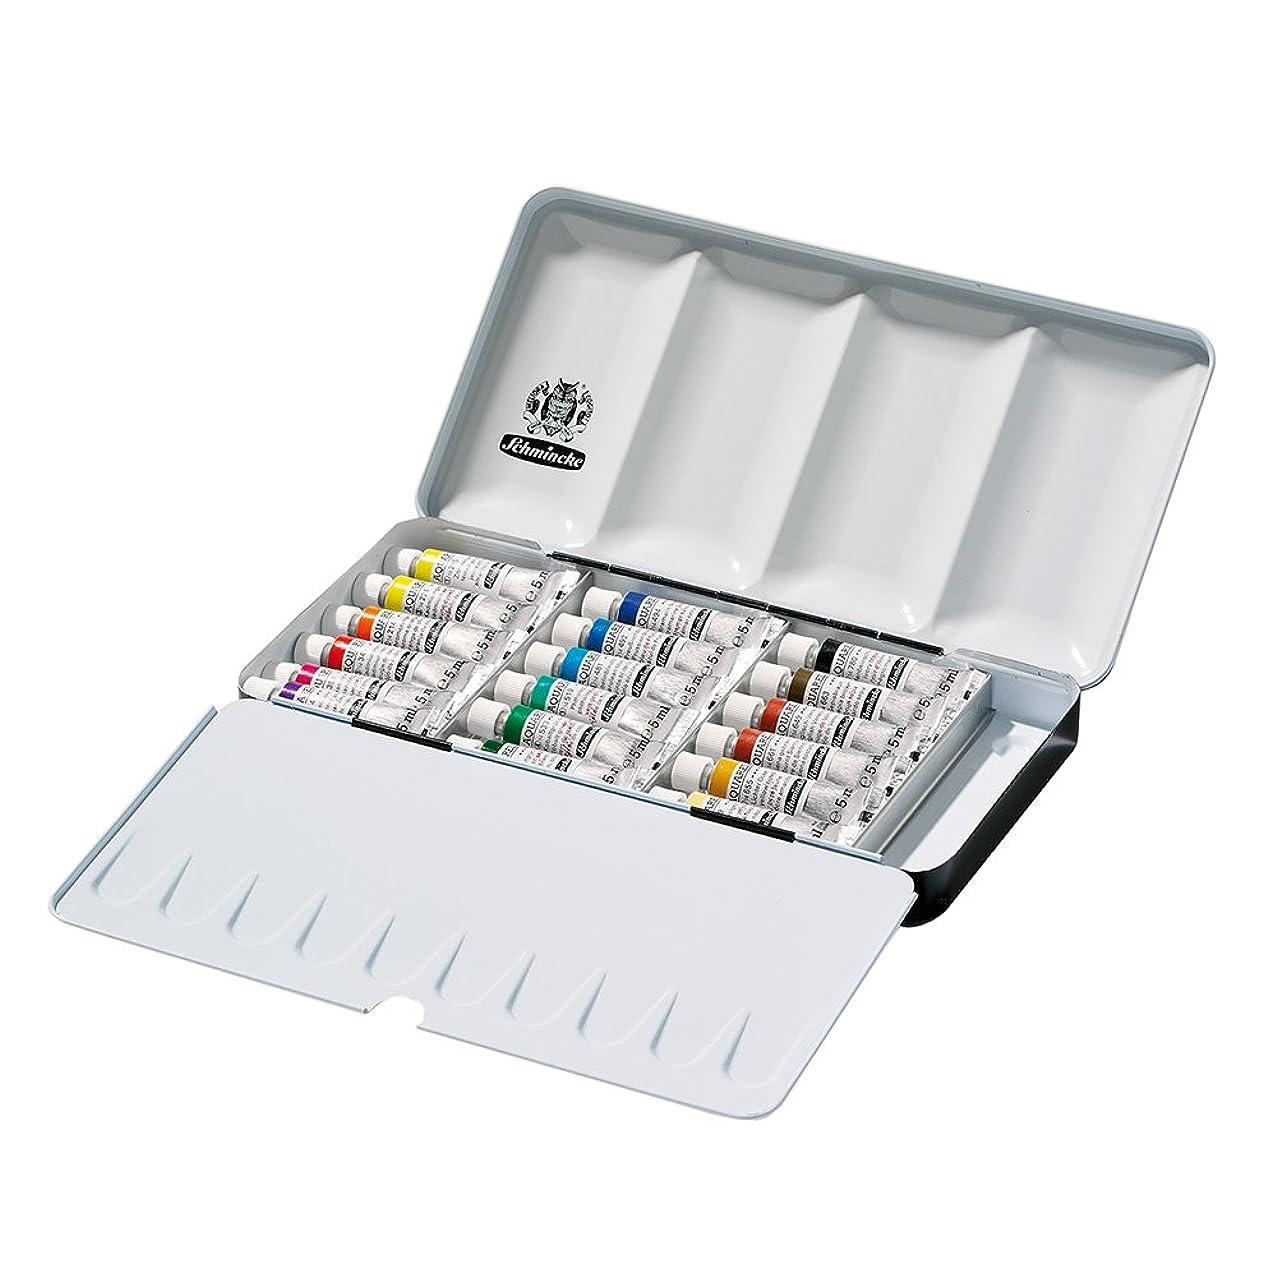 Schmincke Horadam Aquarell 5ml Paint Tube Metal Set, Set of 18 Colors (74118097)